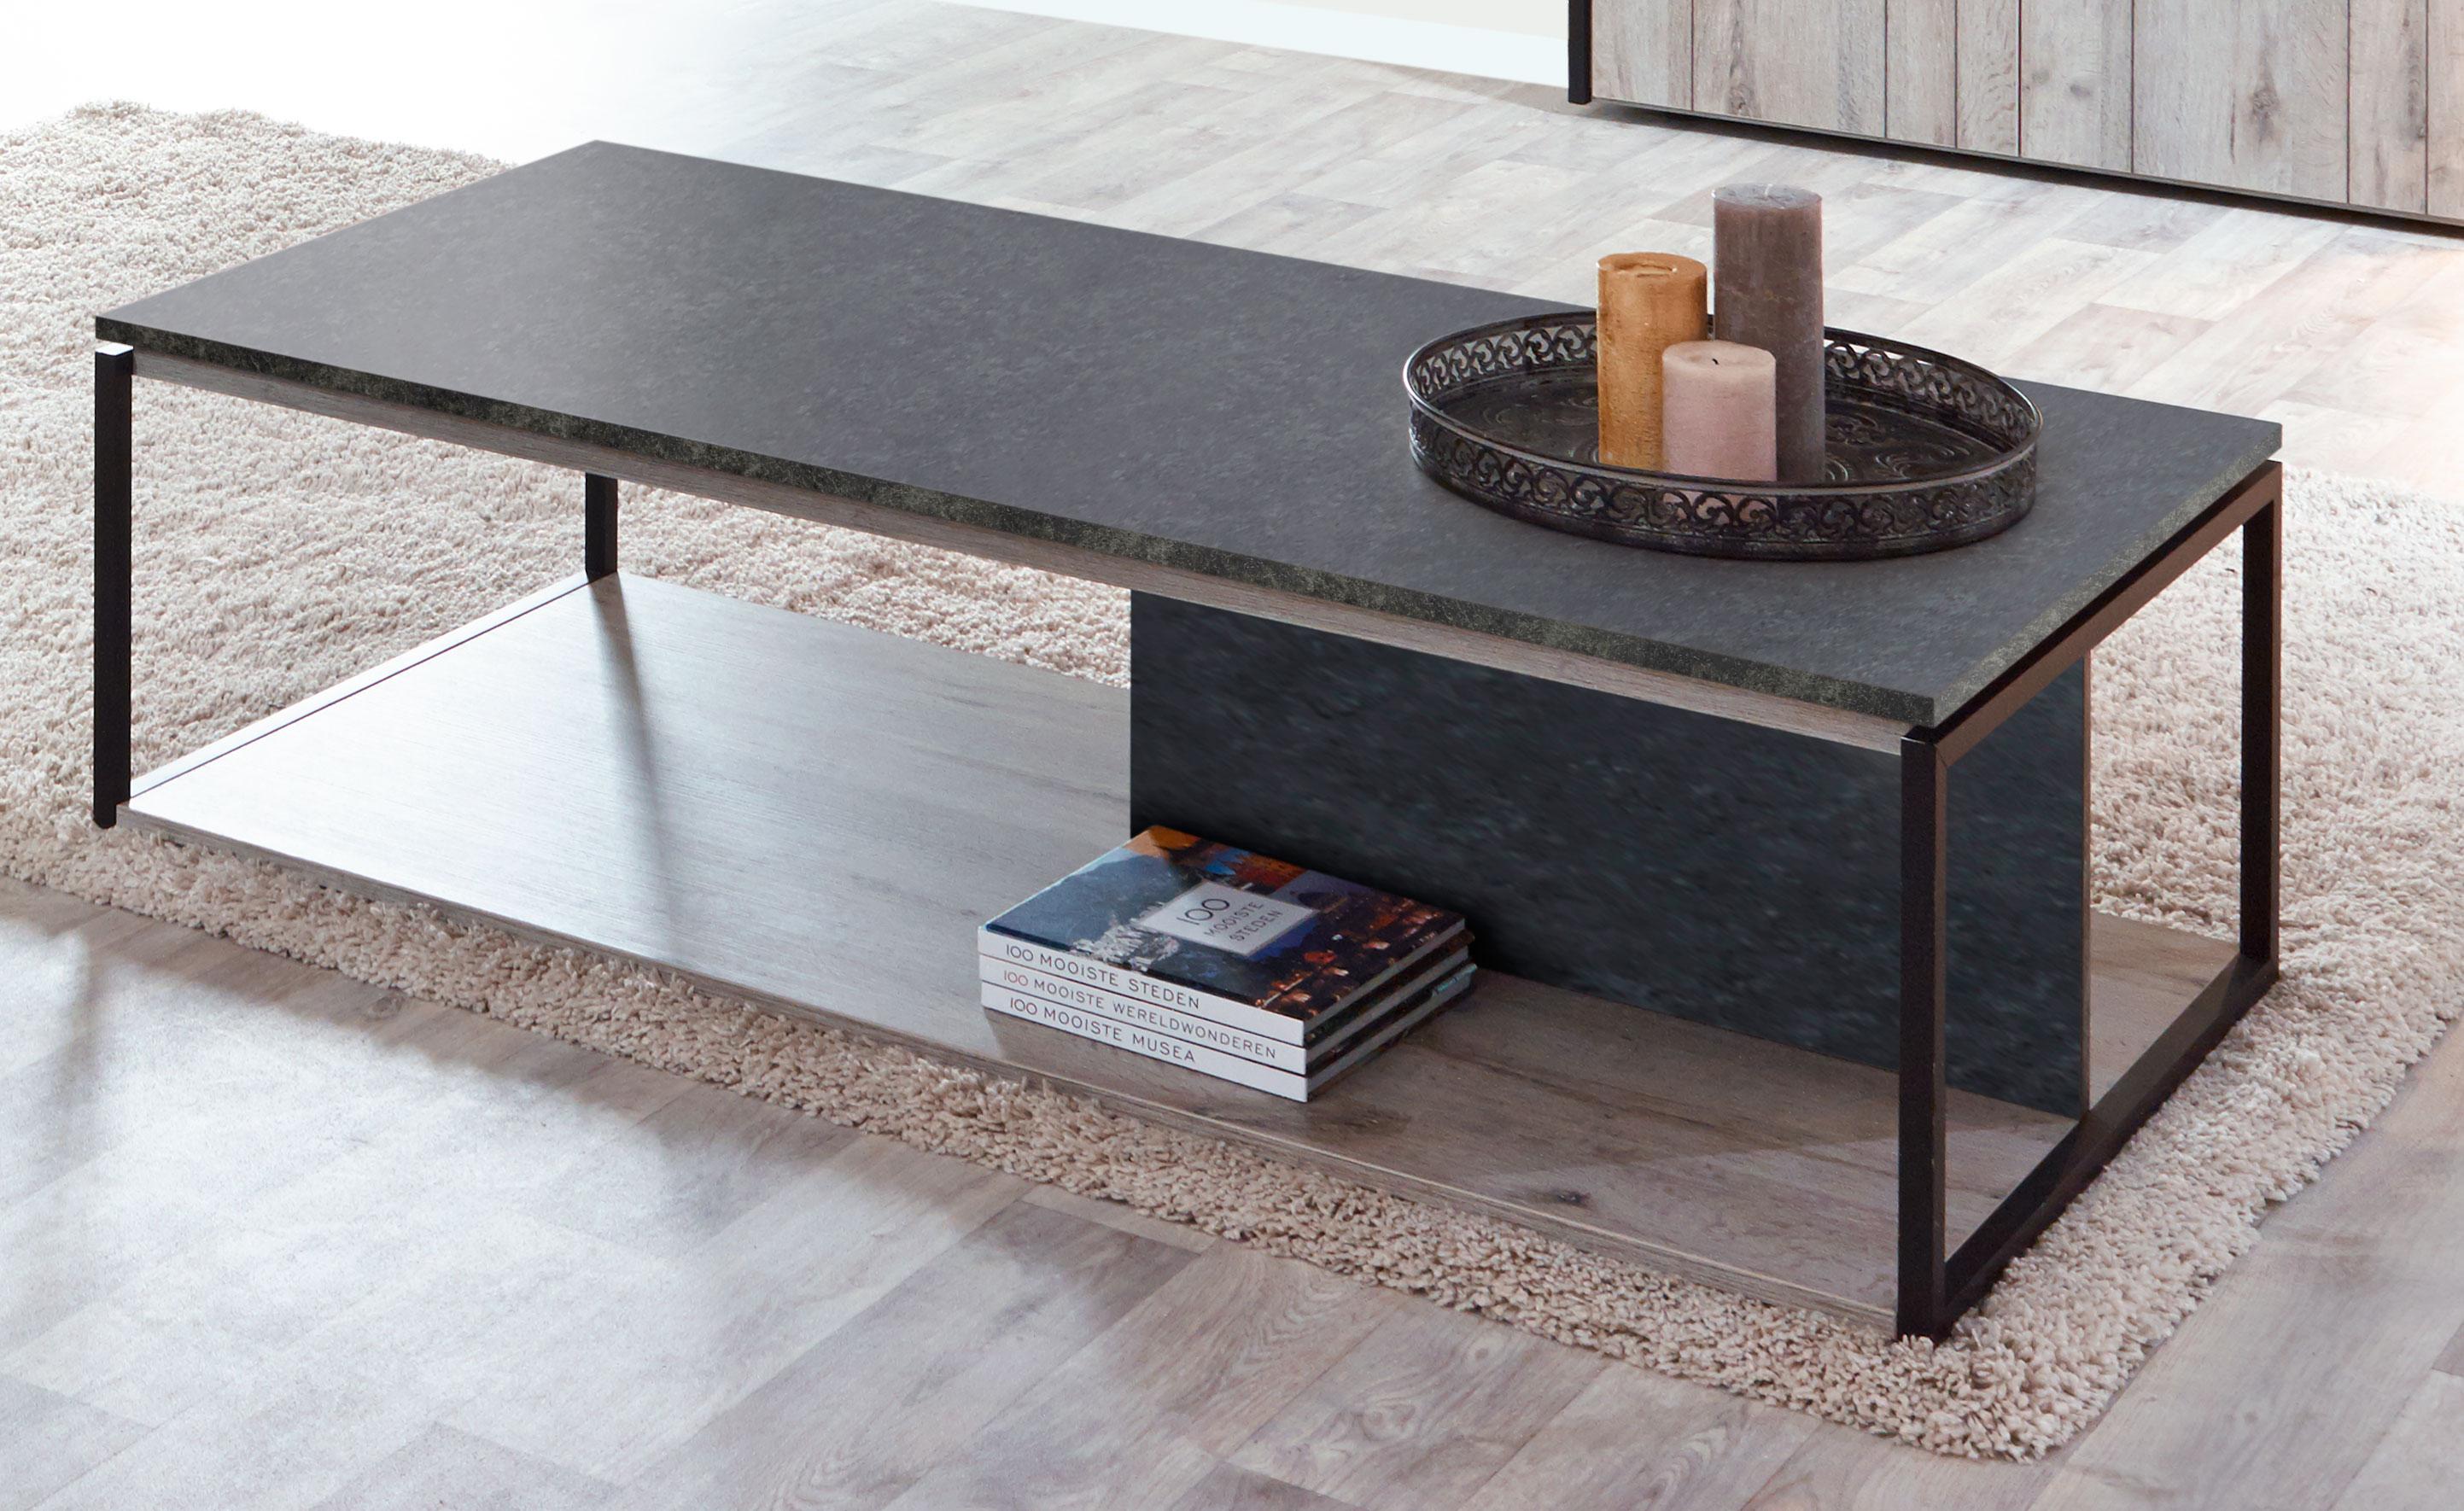 Table basse contemporaine coloris chêne gris/anthracite Cobra